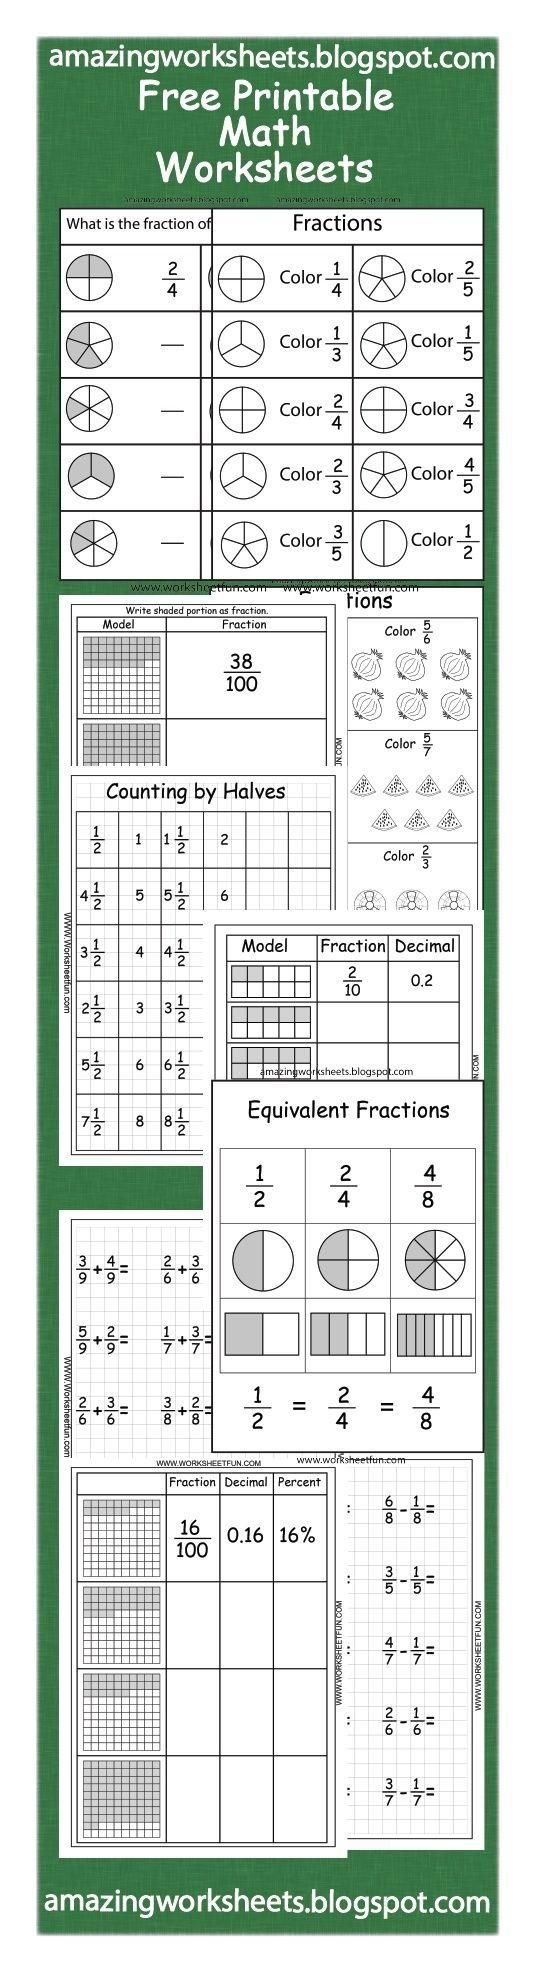 Free Printable Fractions Worksheets by Zulfiqar Ali   Worksheets ...